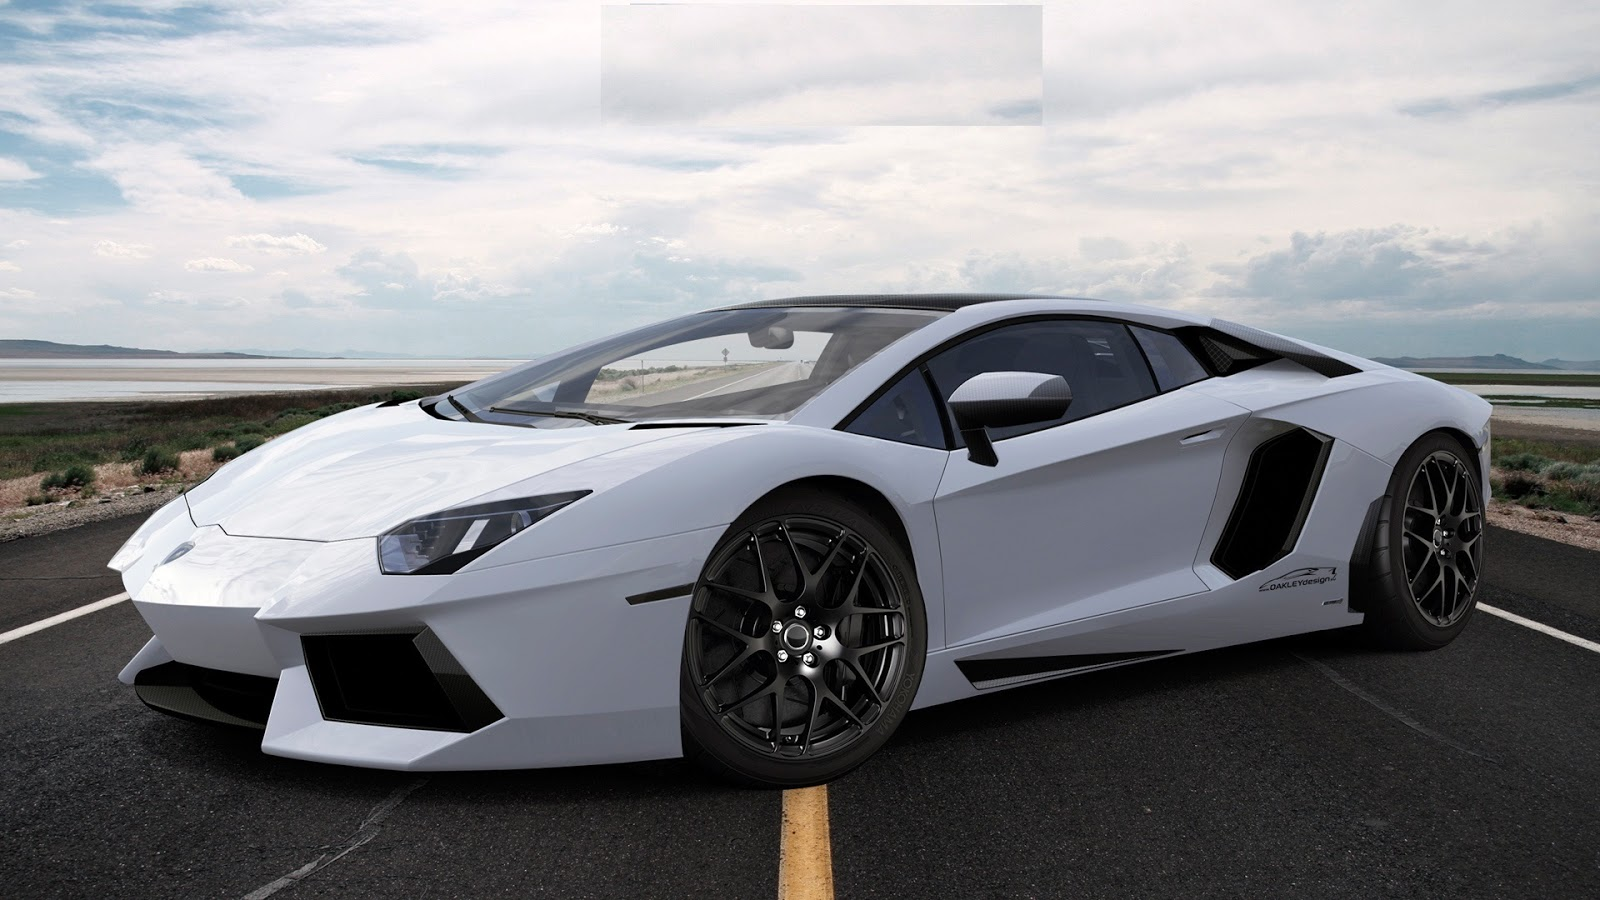 Amazing Wallpaper High Resolution Lamborghini Aventador - White%2BLamborghini%2BAventador%2BHD%2BWallpaperz%2BLioaJKaw89  Graphic_14394.jpg